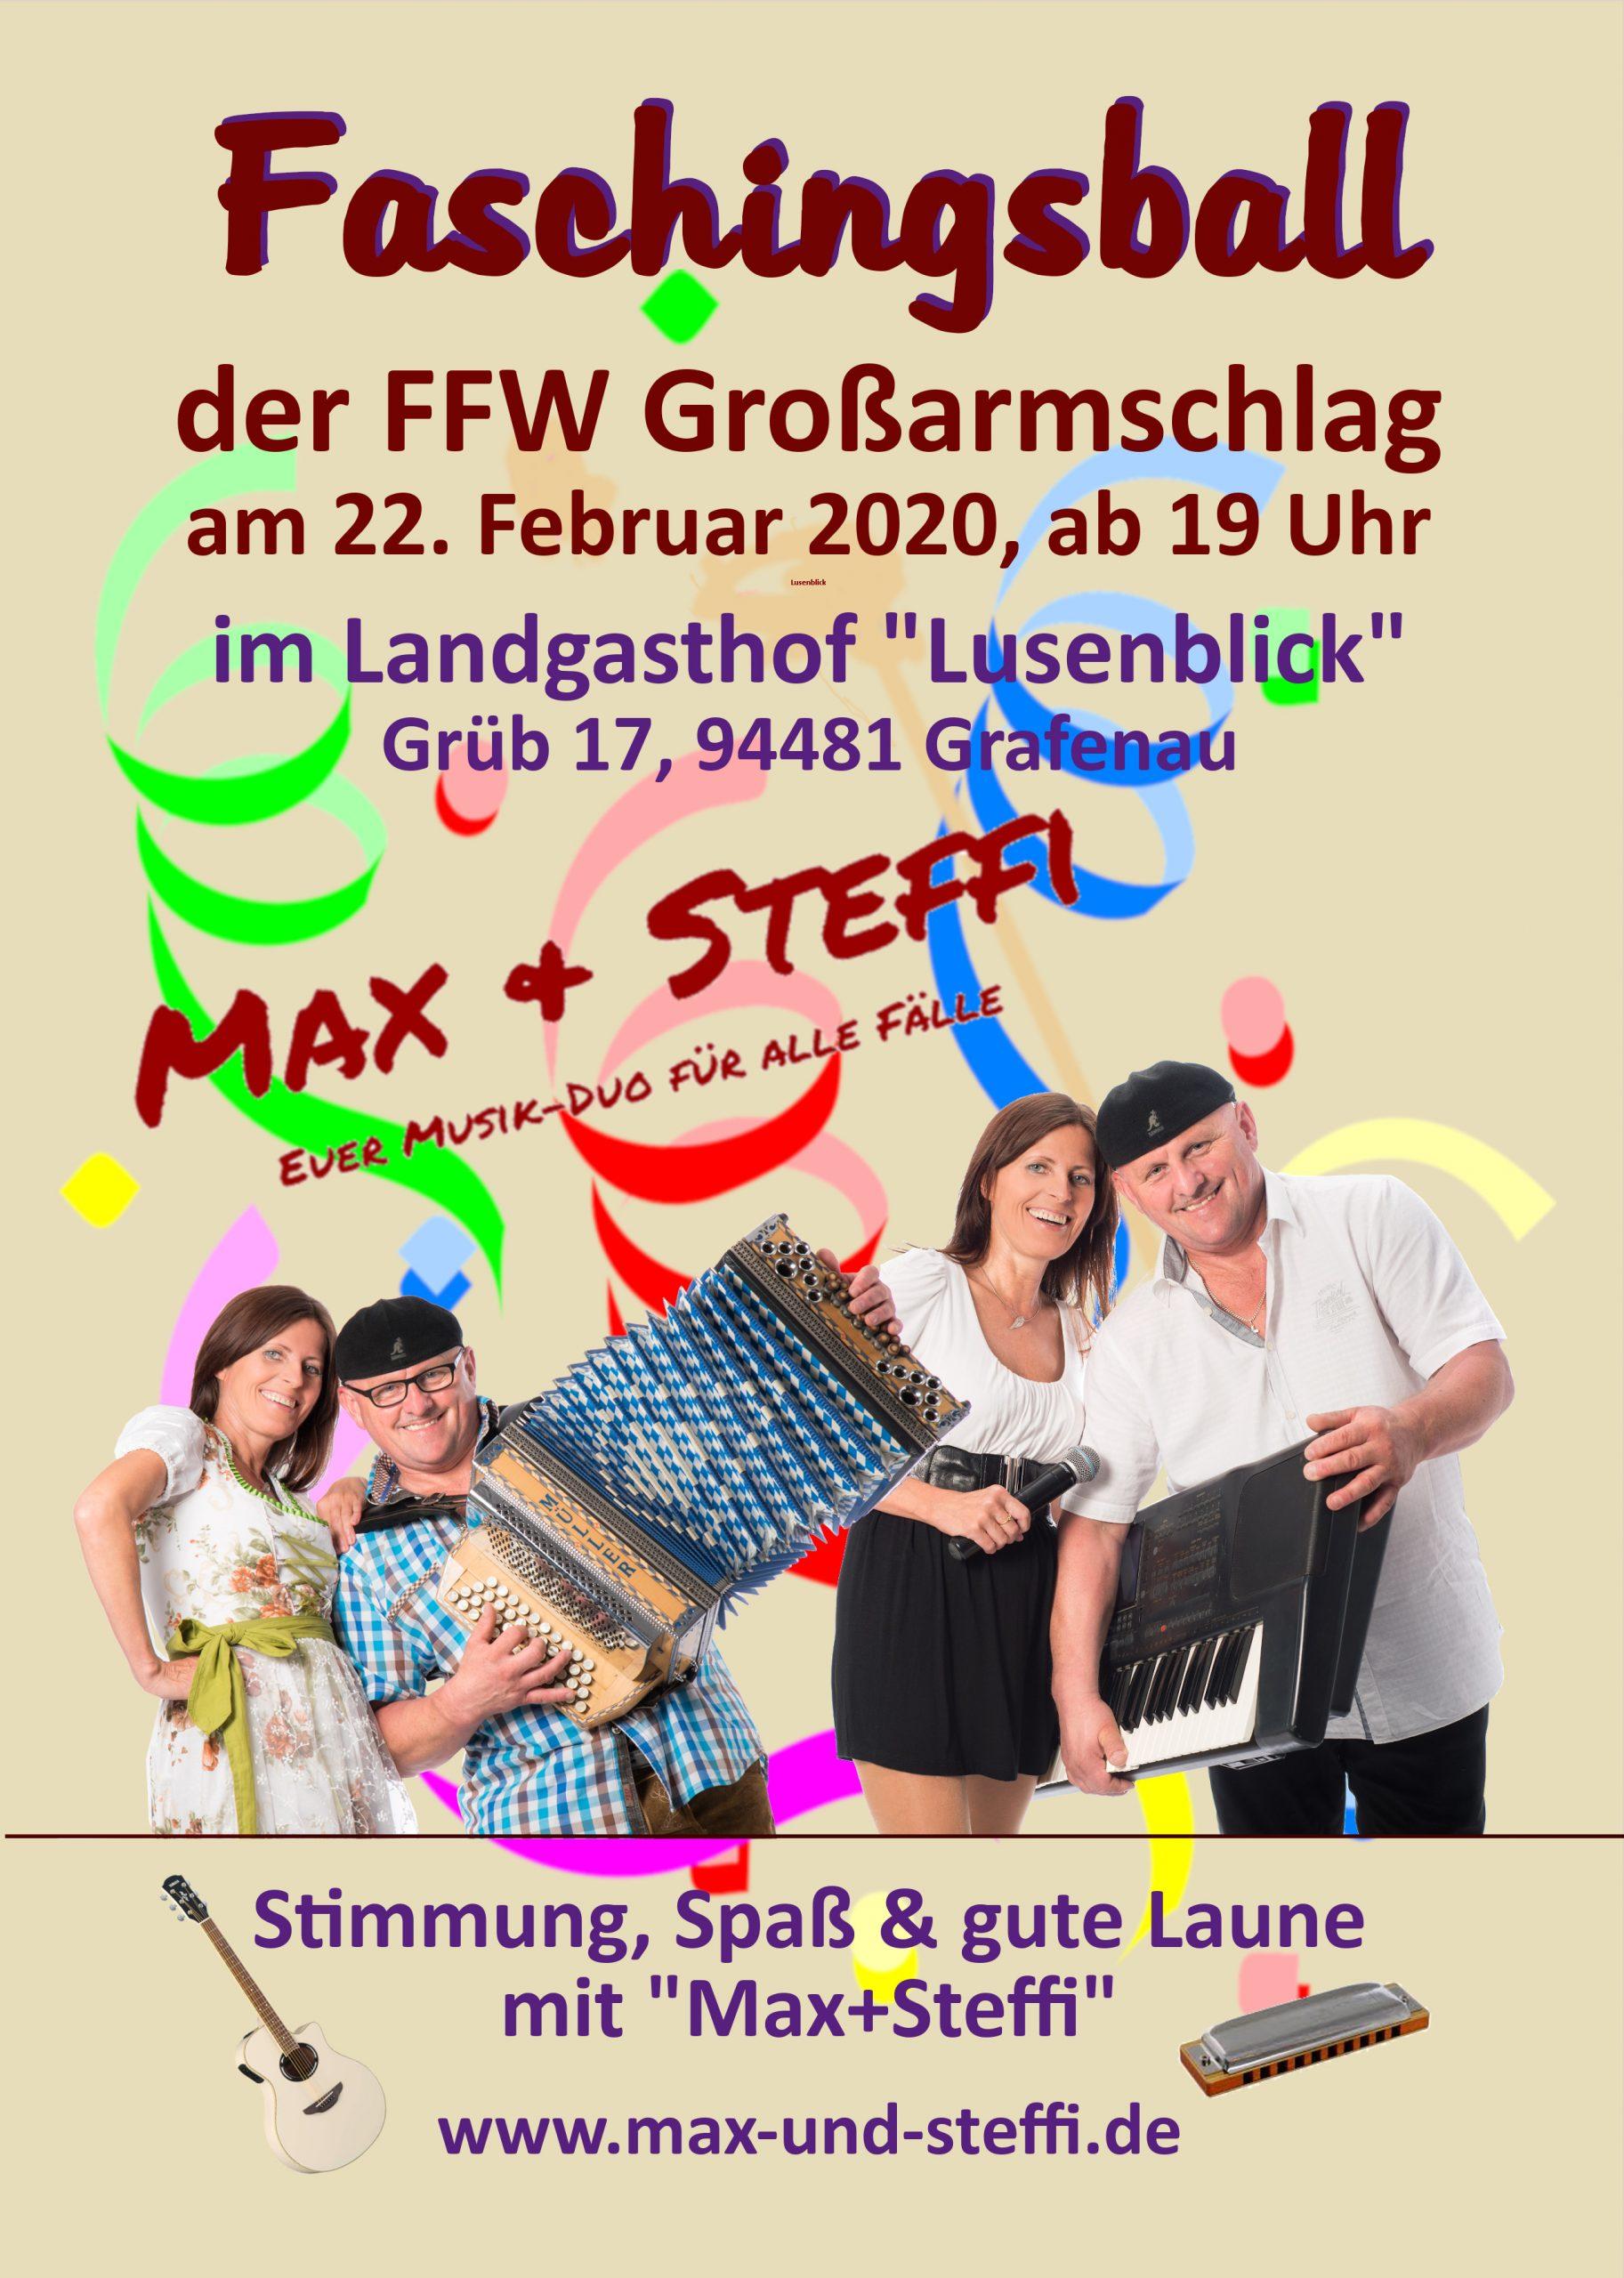 "Faschingsball der FFW Großarmschlag in Grafenau @ im Landgasthof ""Lusenblick"" Grafenau"